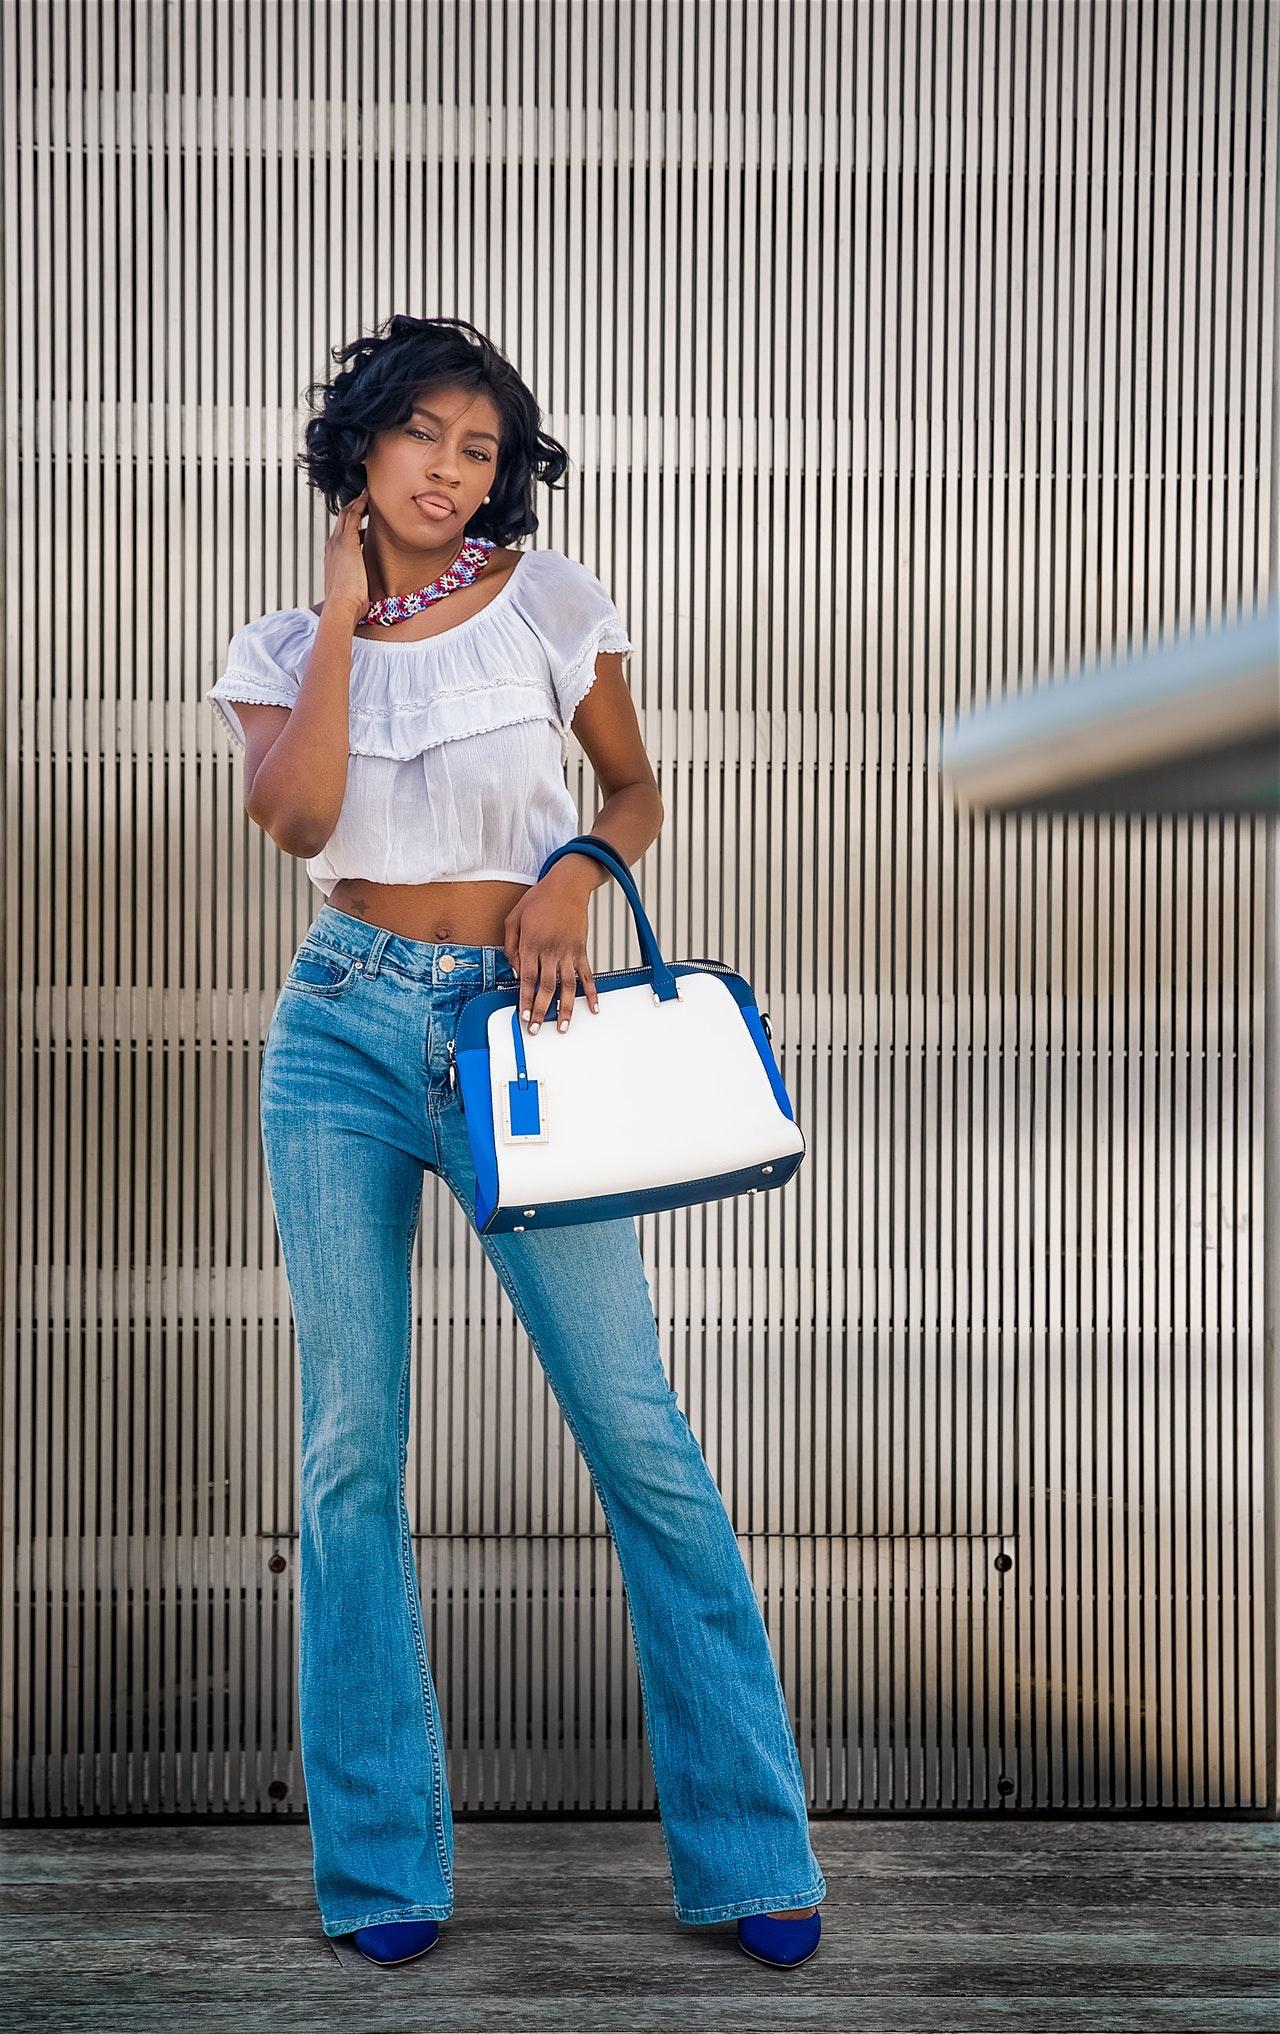 Melvena's Model portfolio